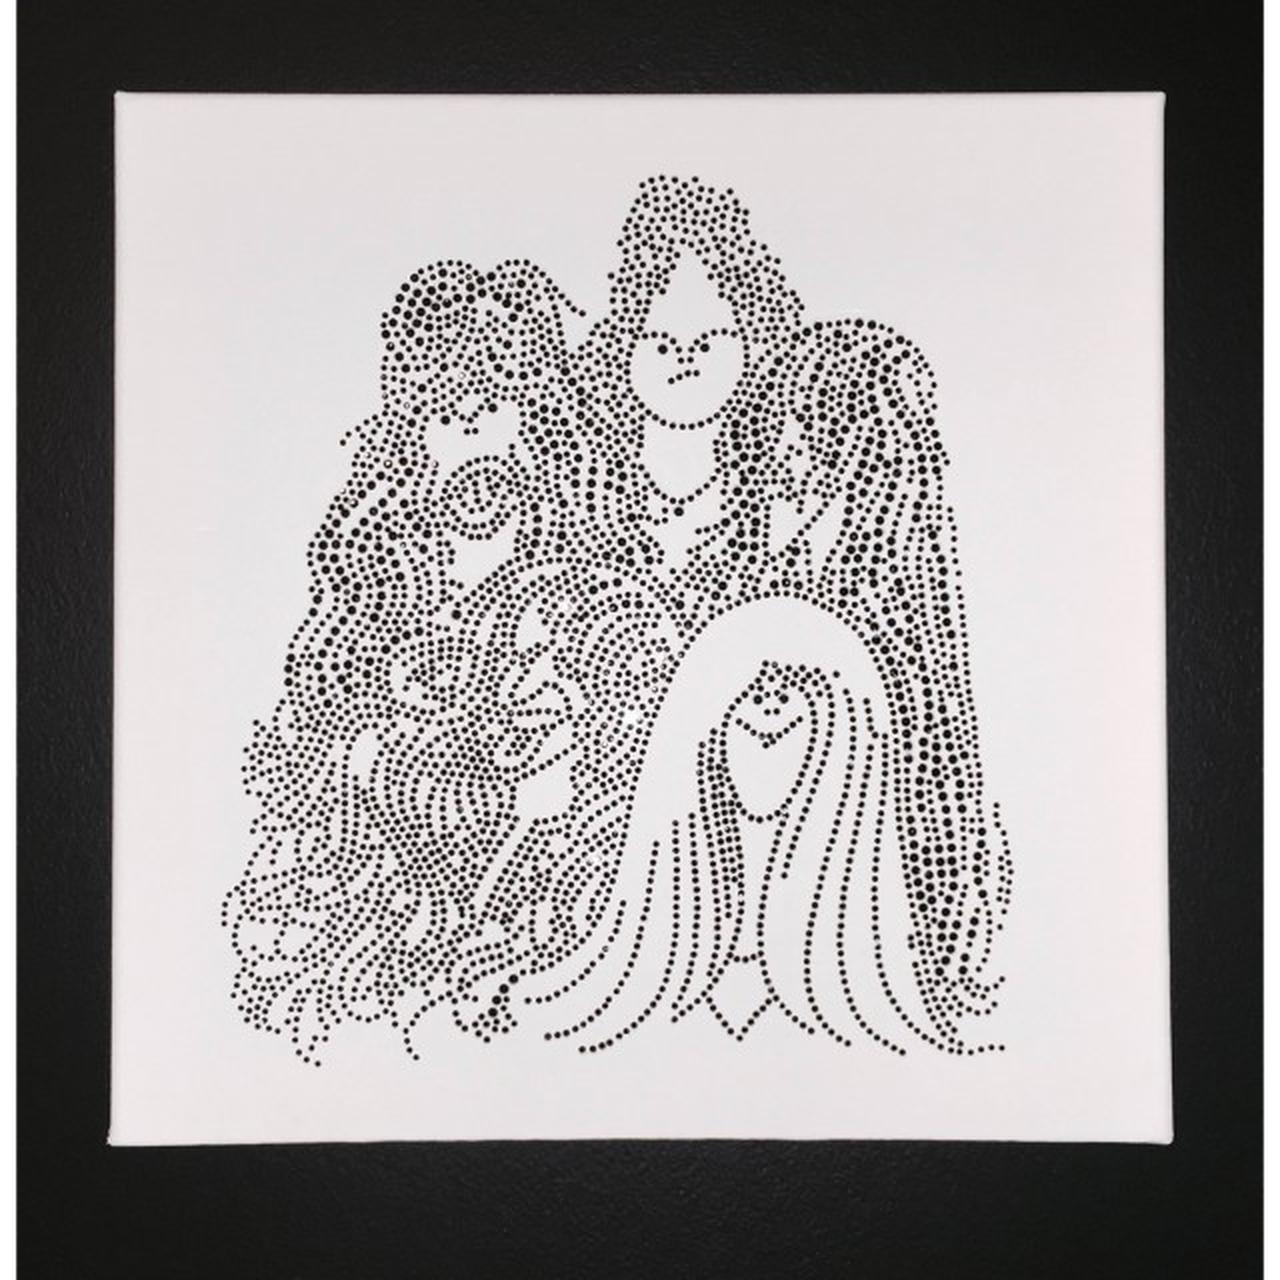 Aerosmith Iconic Draw The Line Bling Canvas